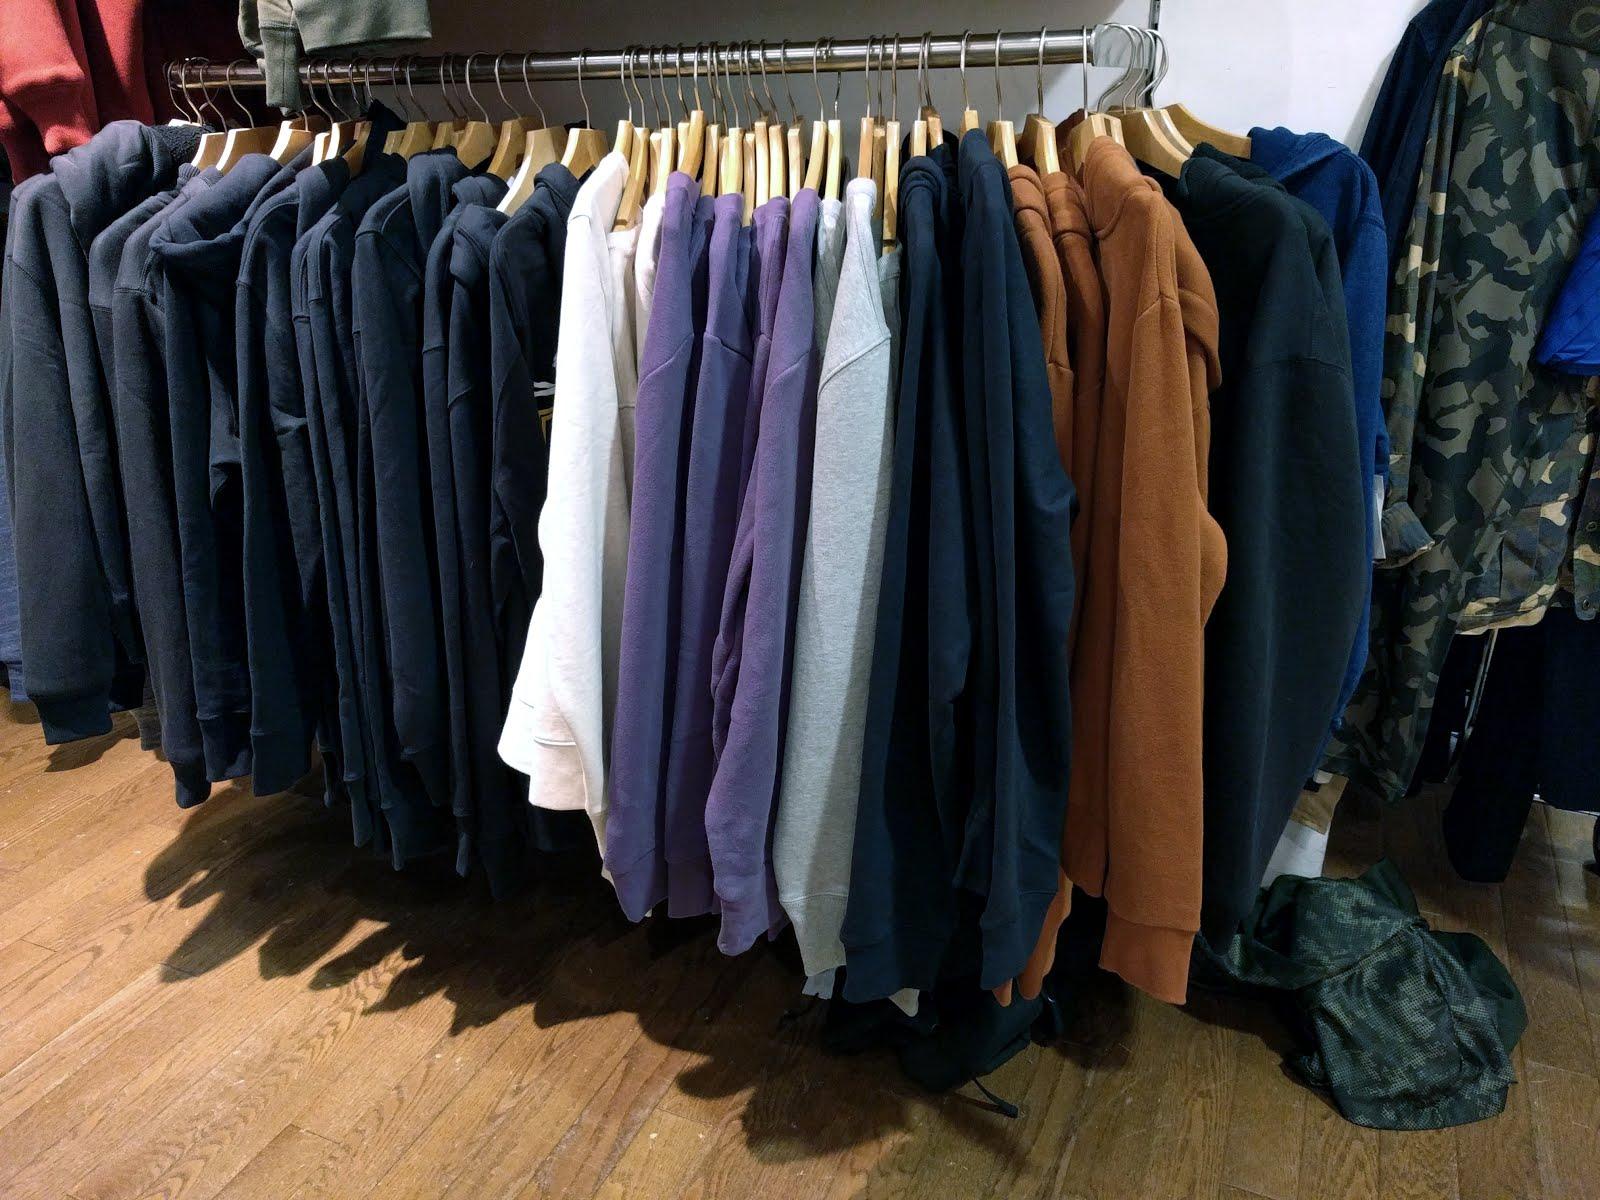 Rack full of sweatshirts and hoodies from all GQ×GAP brands. Interestingly b6c0f1c279ca